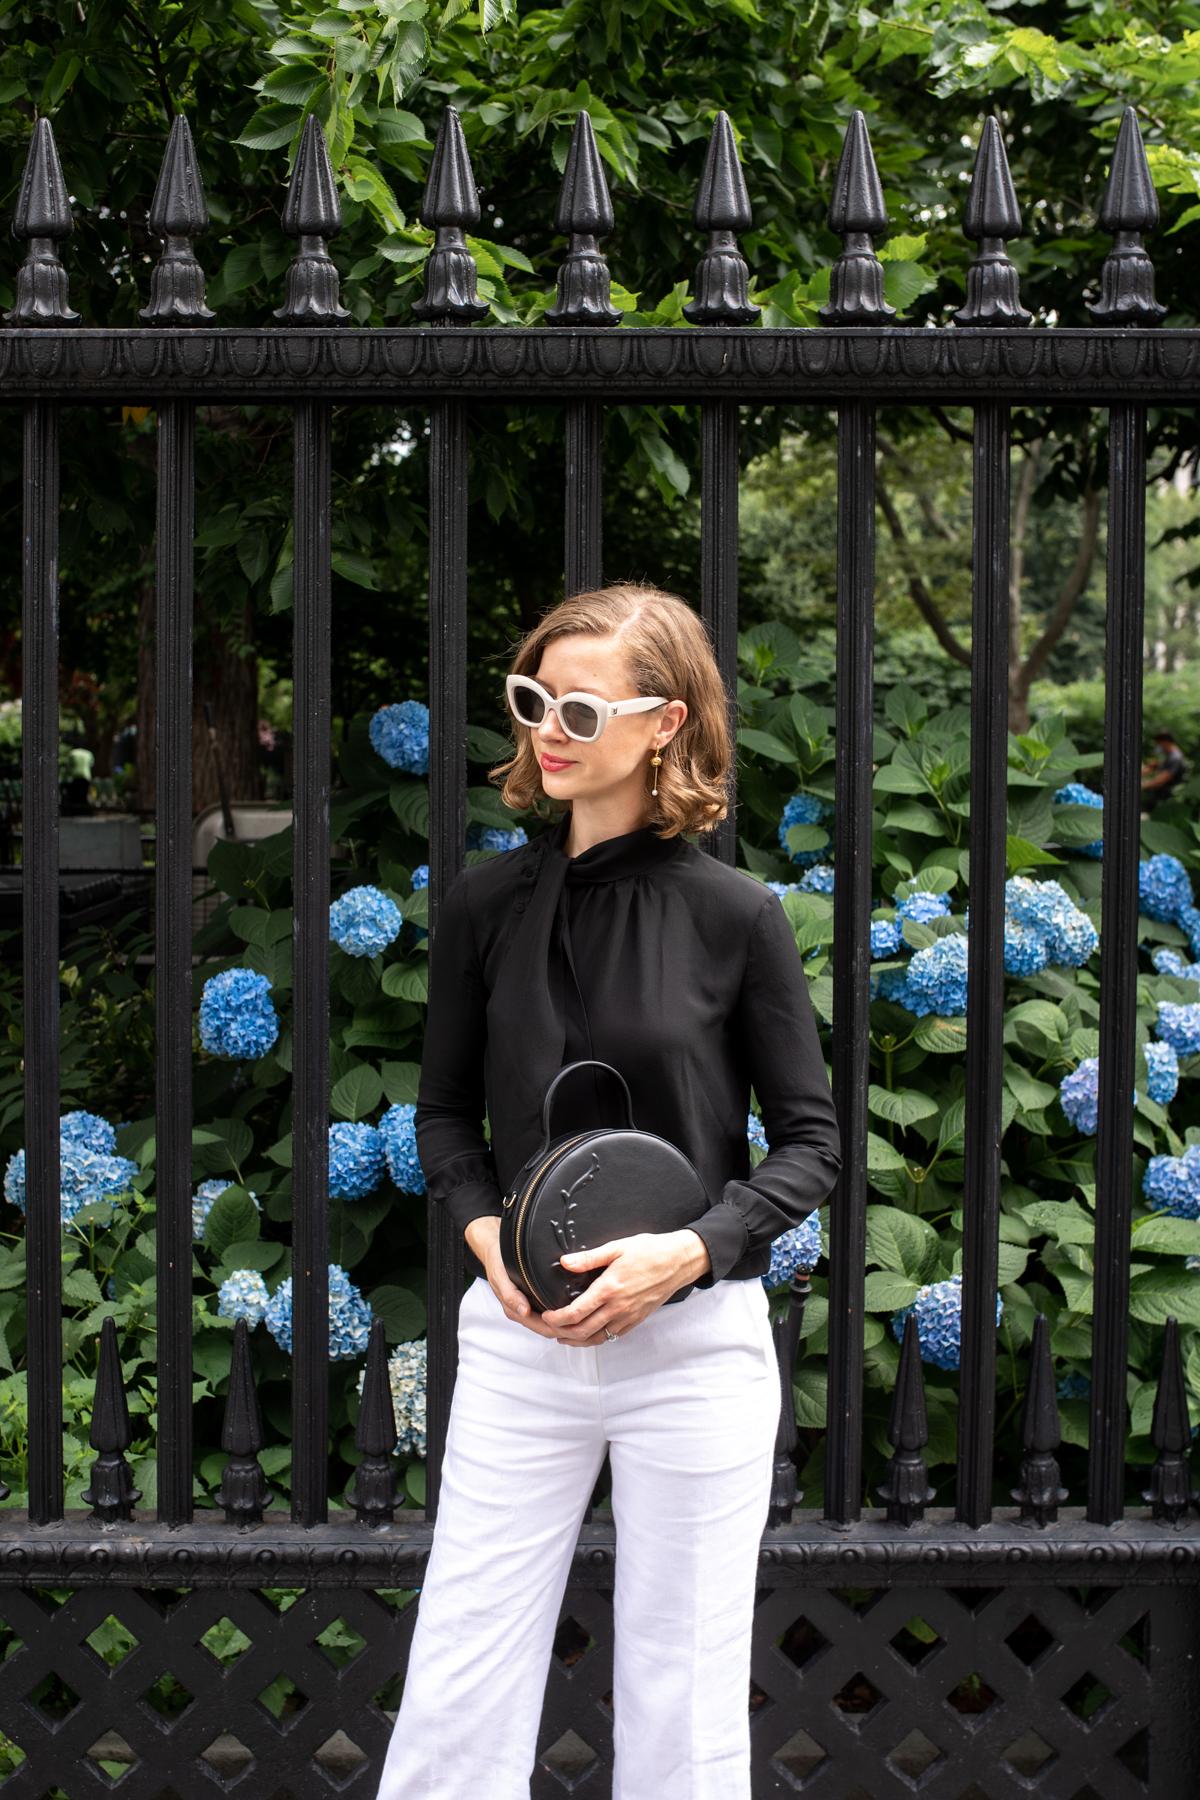 Stacie Flinner x Tell No Leyes Bag-4.jpg